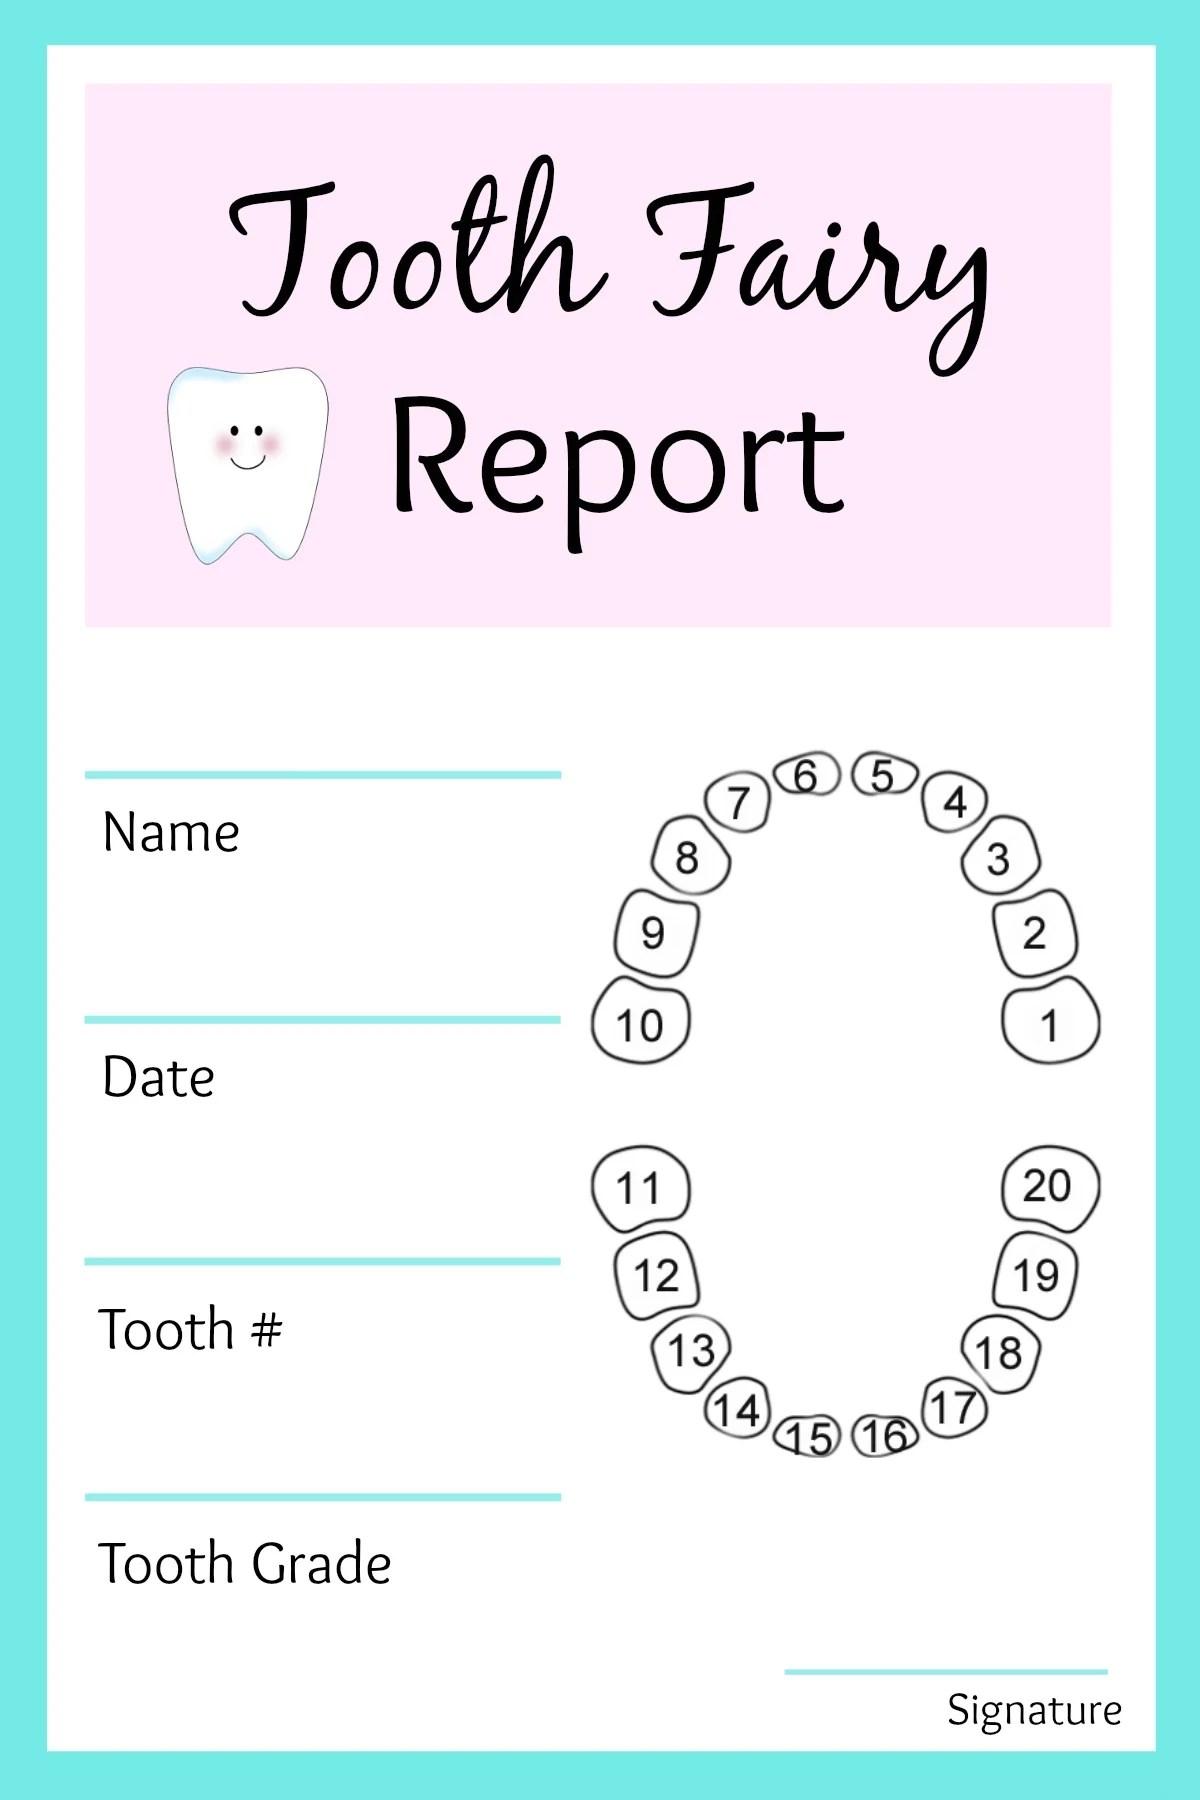 Tooth Fairy Report 1 200 1 800 Pixels